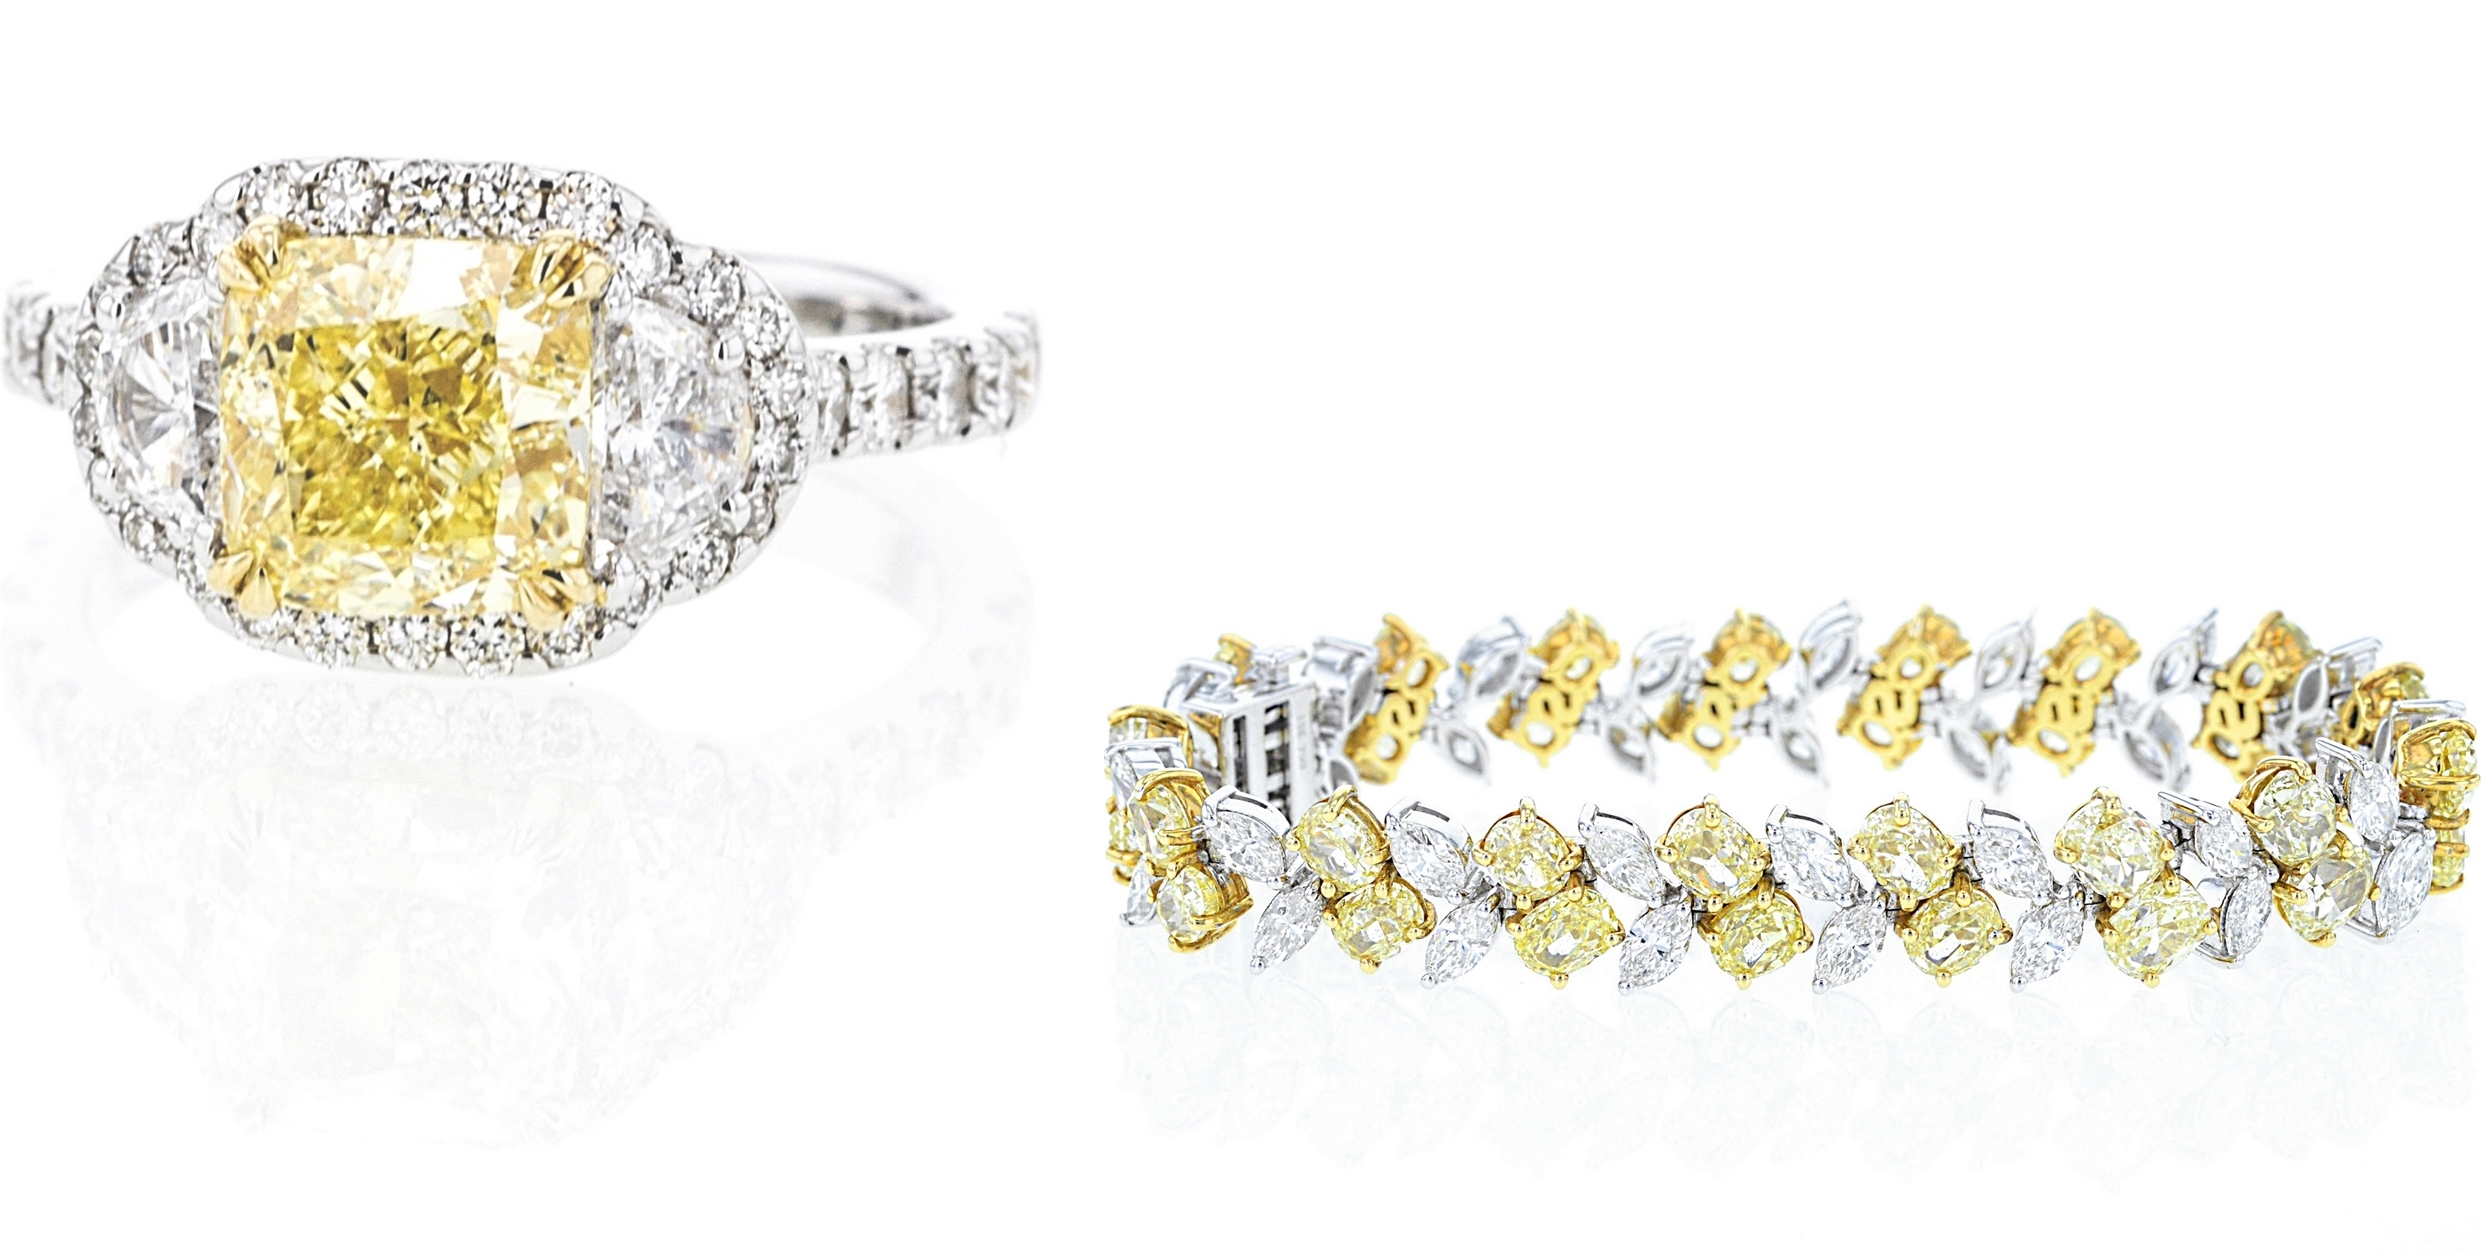 Delfi Orchard The Canary Diamond